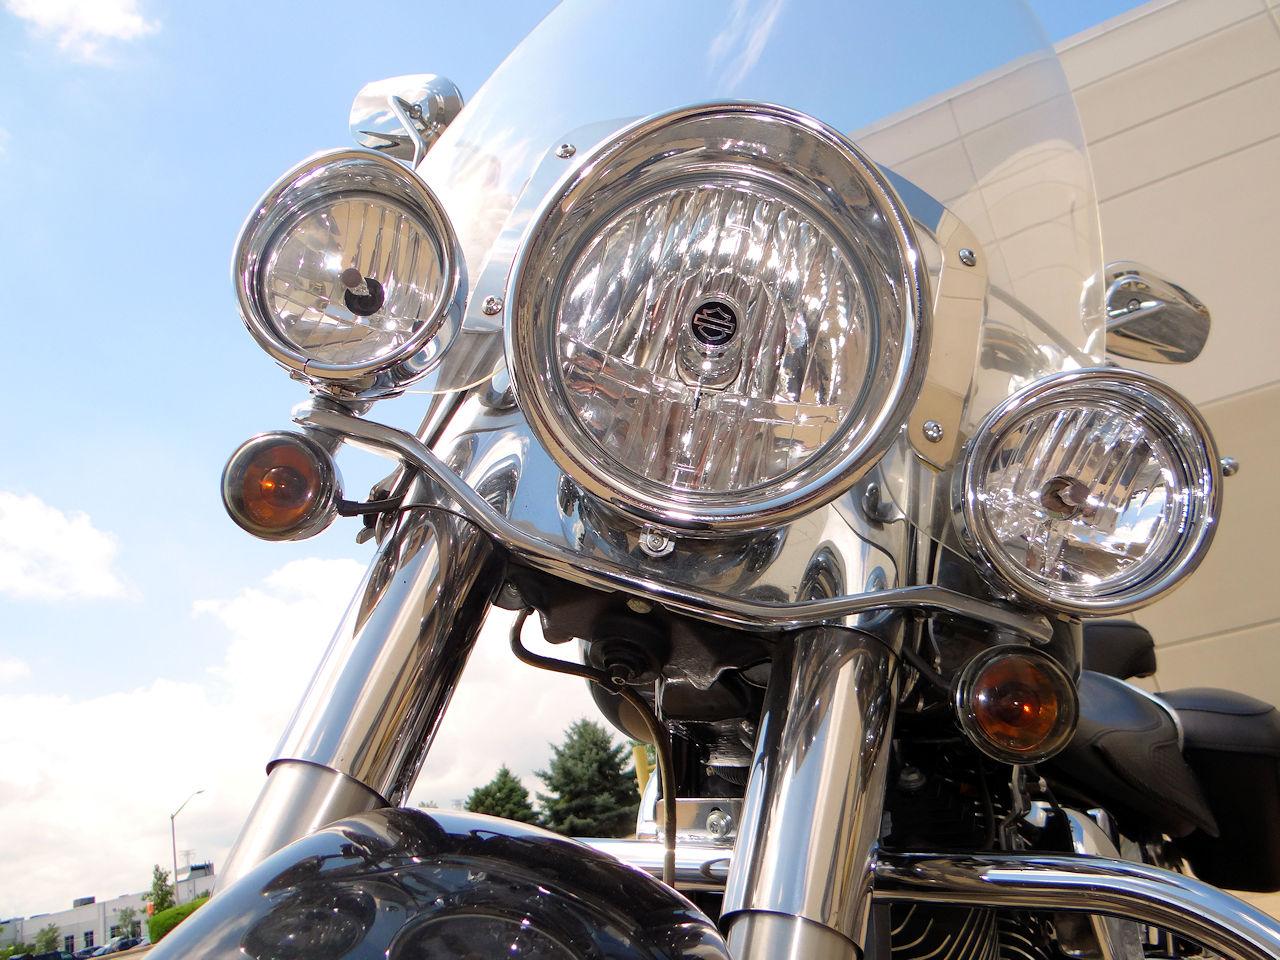 2006 Harley Davidson FLSTNI 13